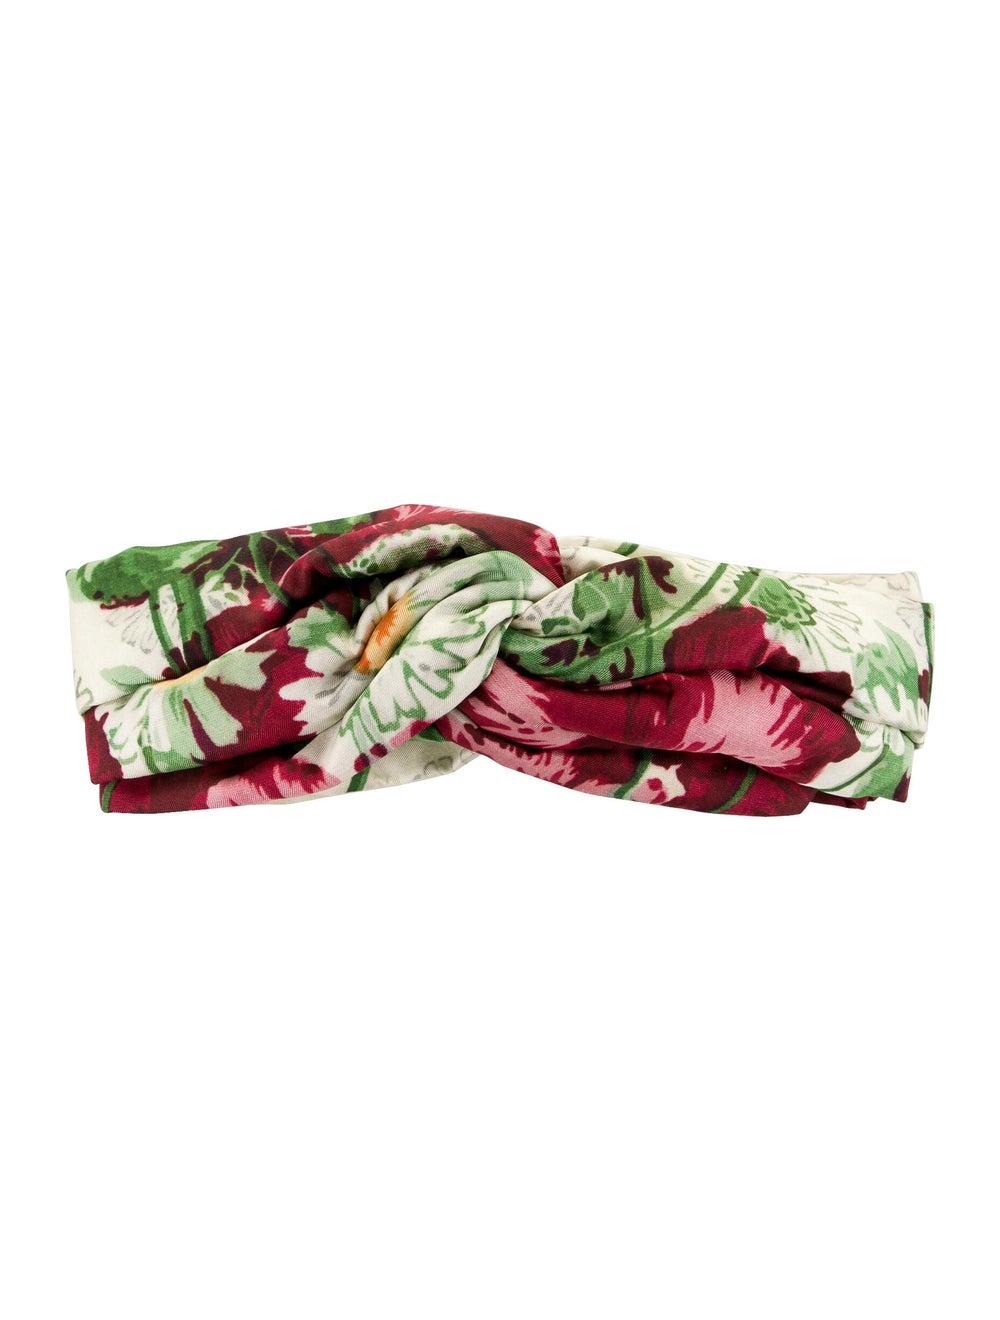 Gucci Silk Floral Headband multicolor - image 1